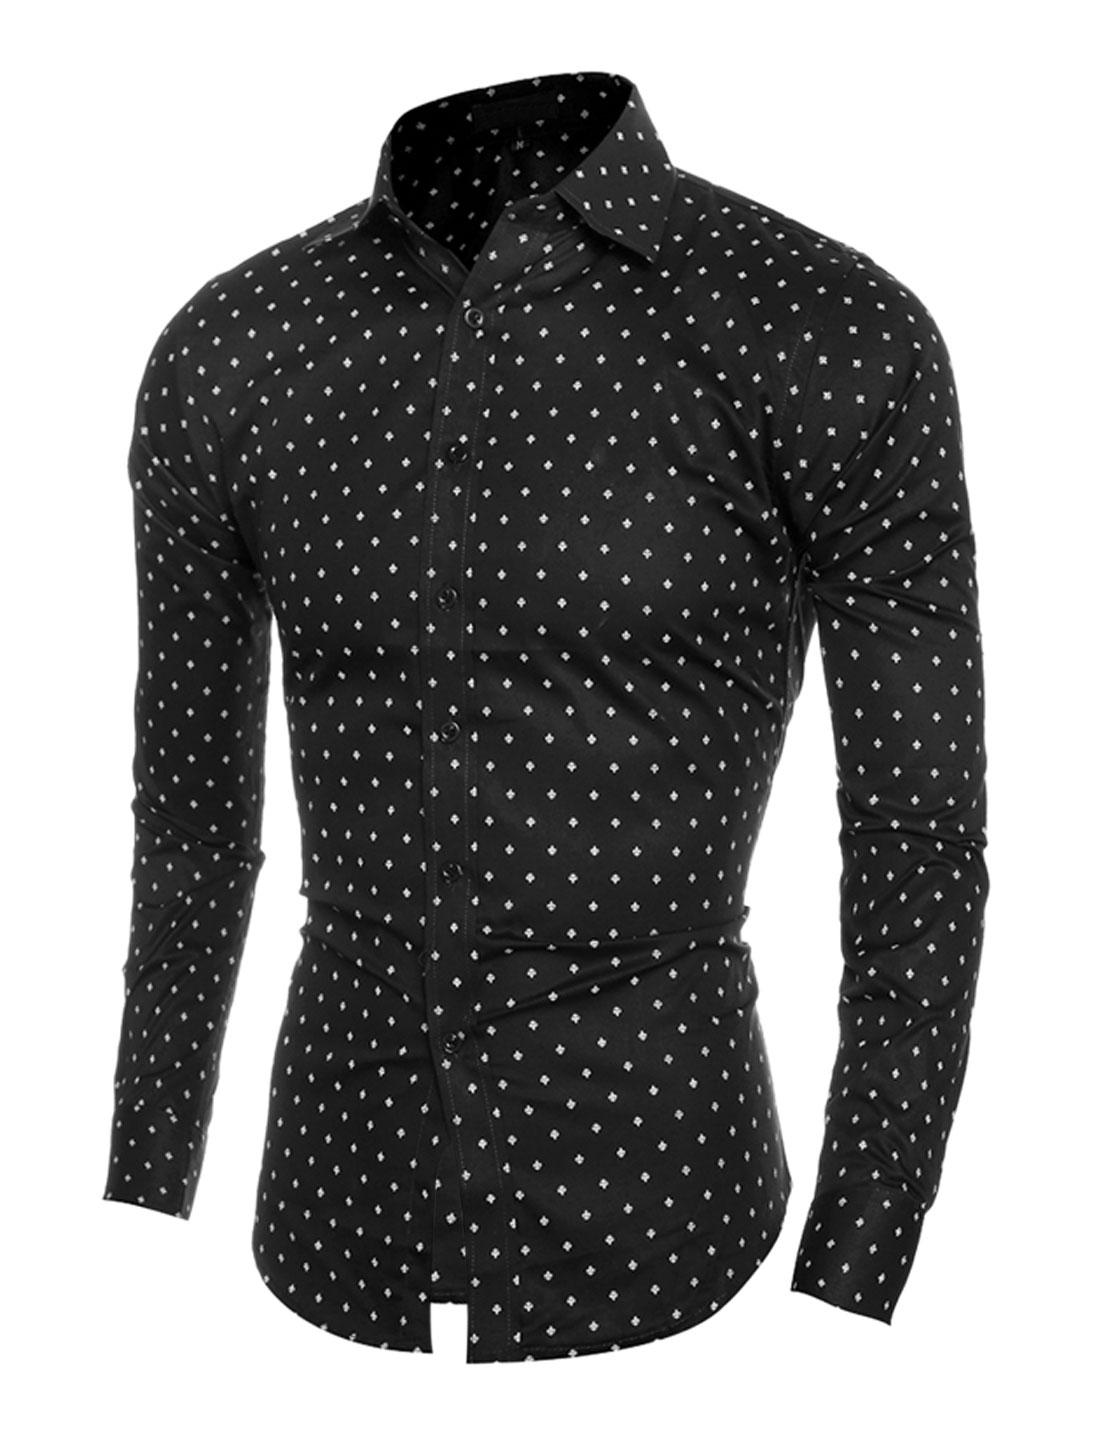 Men Point Collar Long Sleeves Airplane Prints Slim Fit Shirt Black S